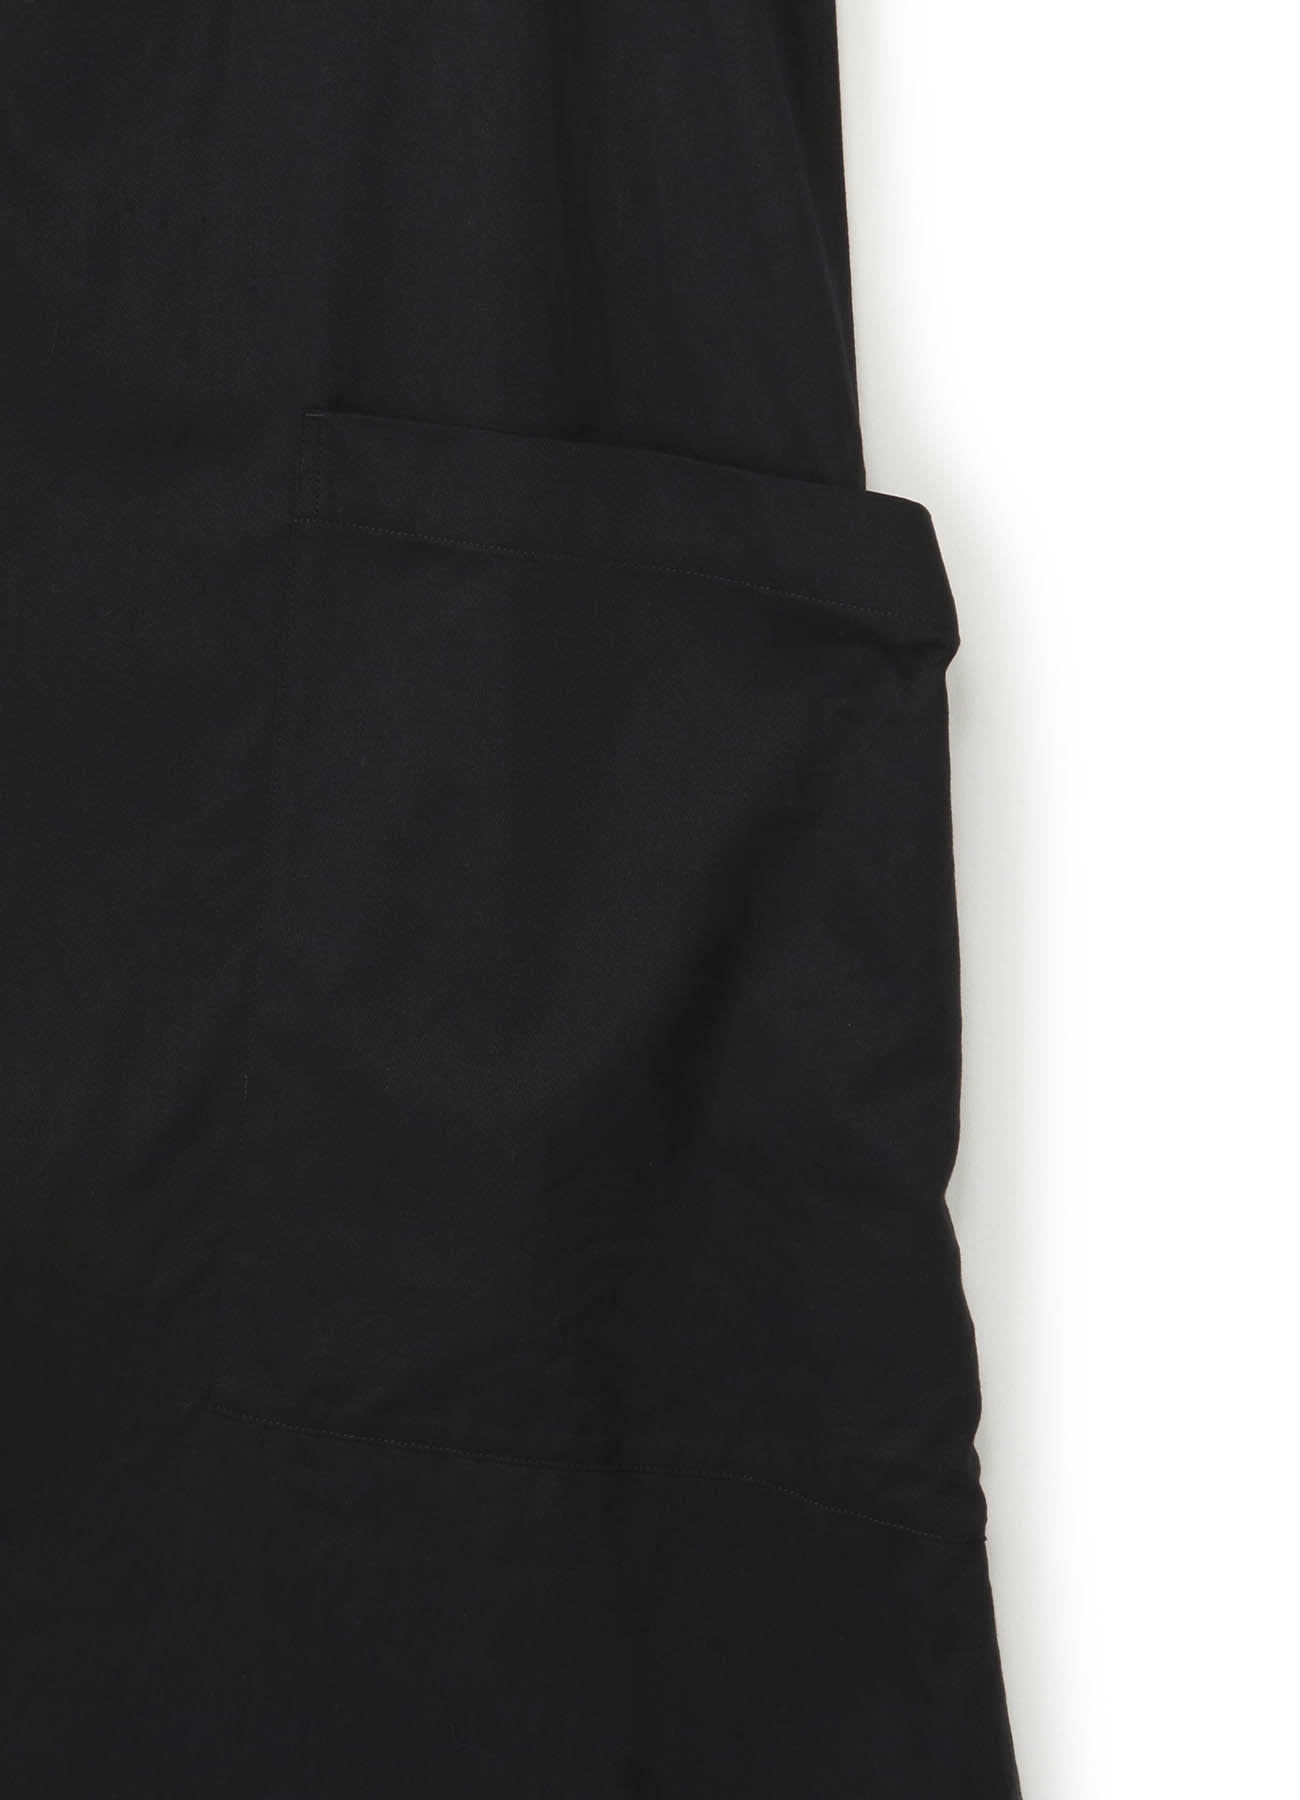 Y's-BORN PRODUCT棉质斜纹四扣长裙